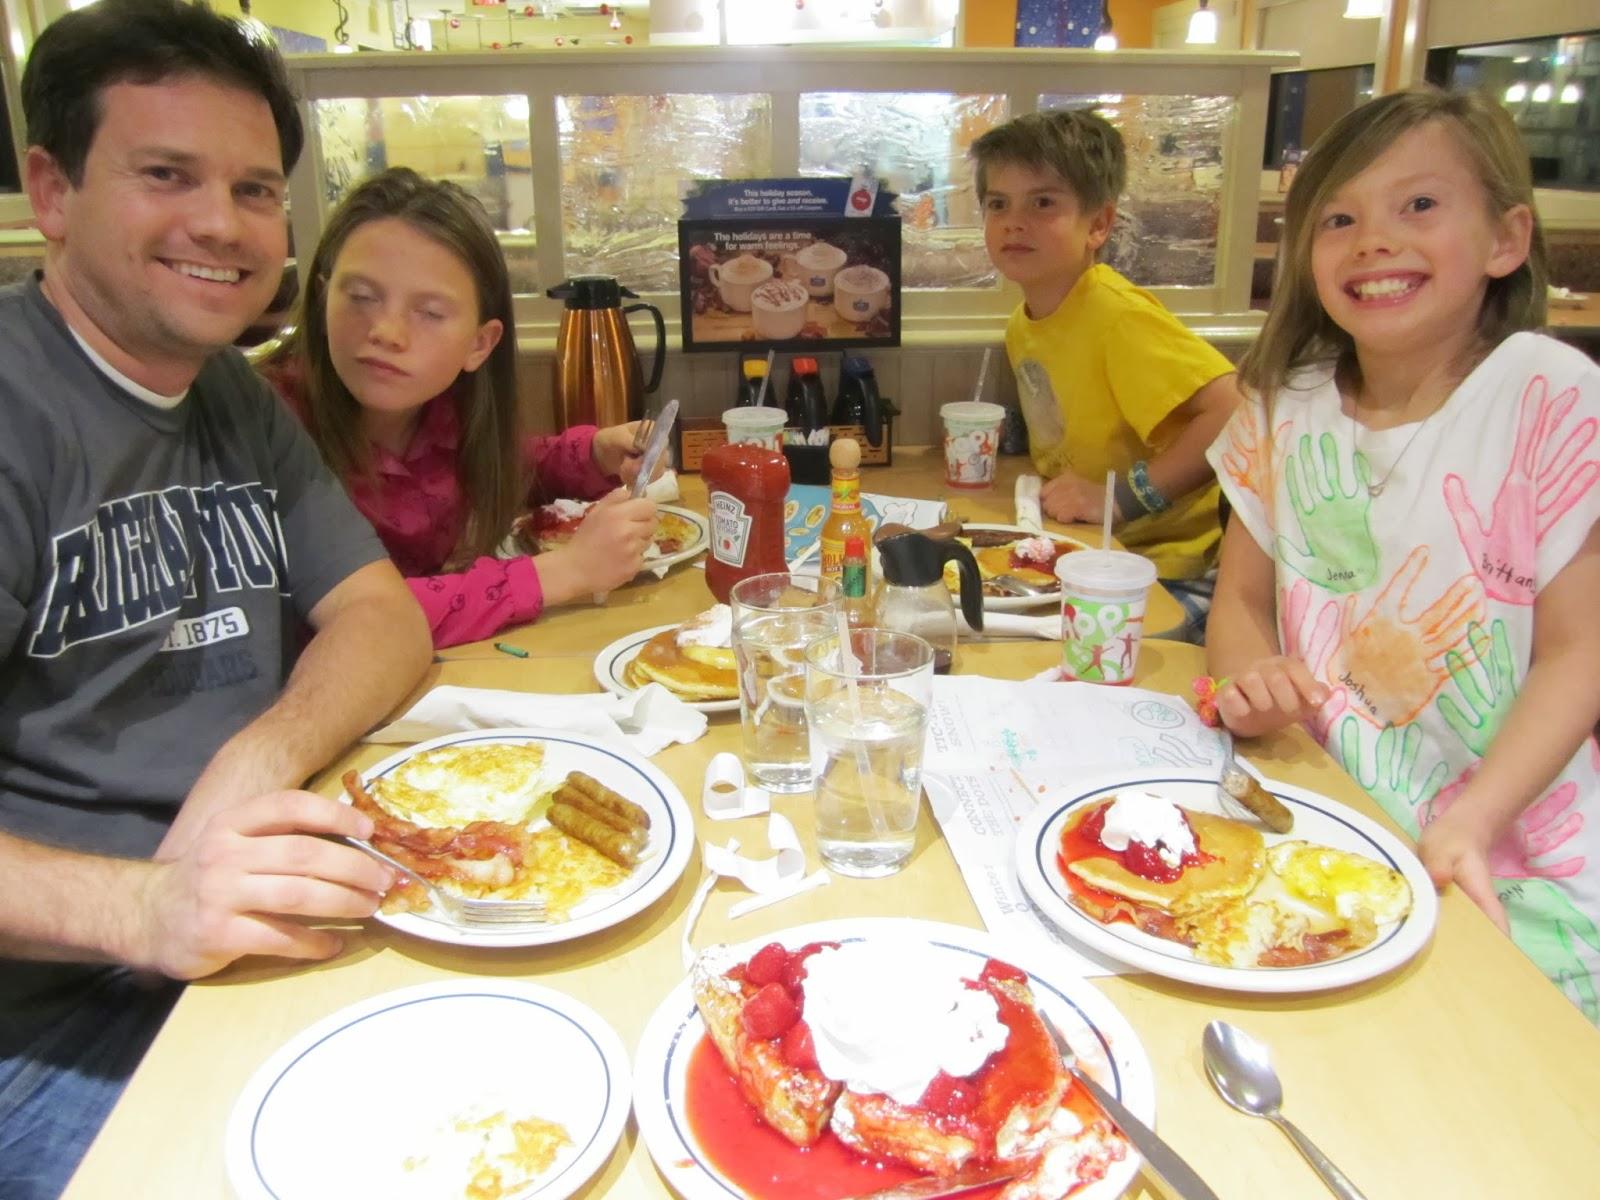 texas, dallas, family dinner, road trip